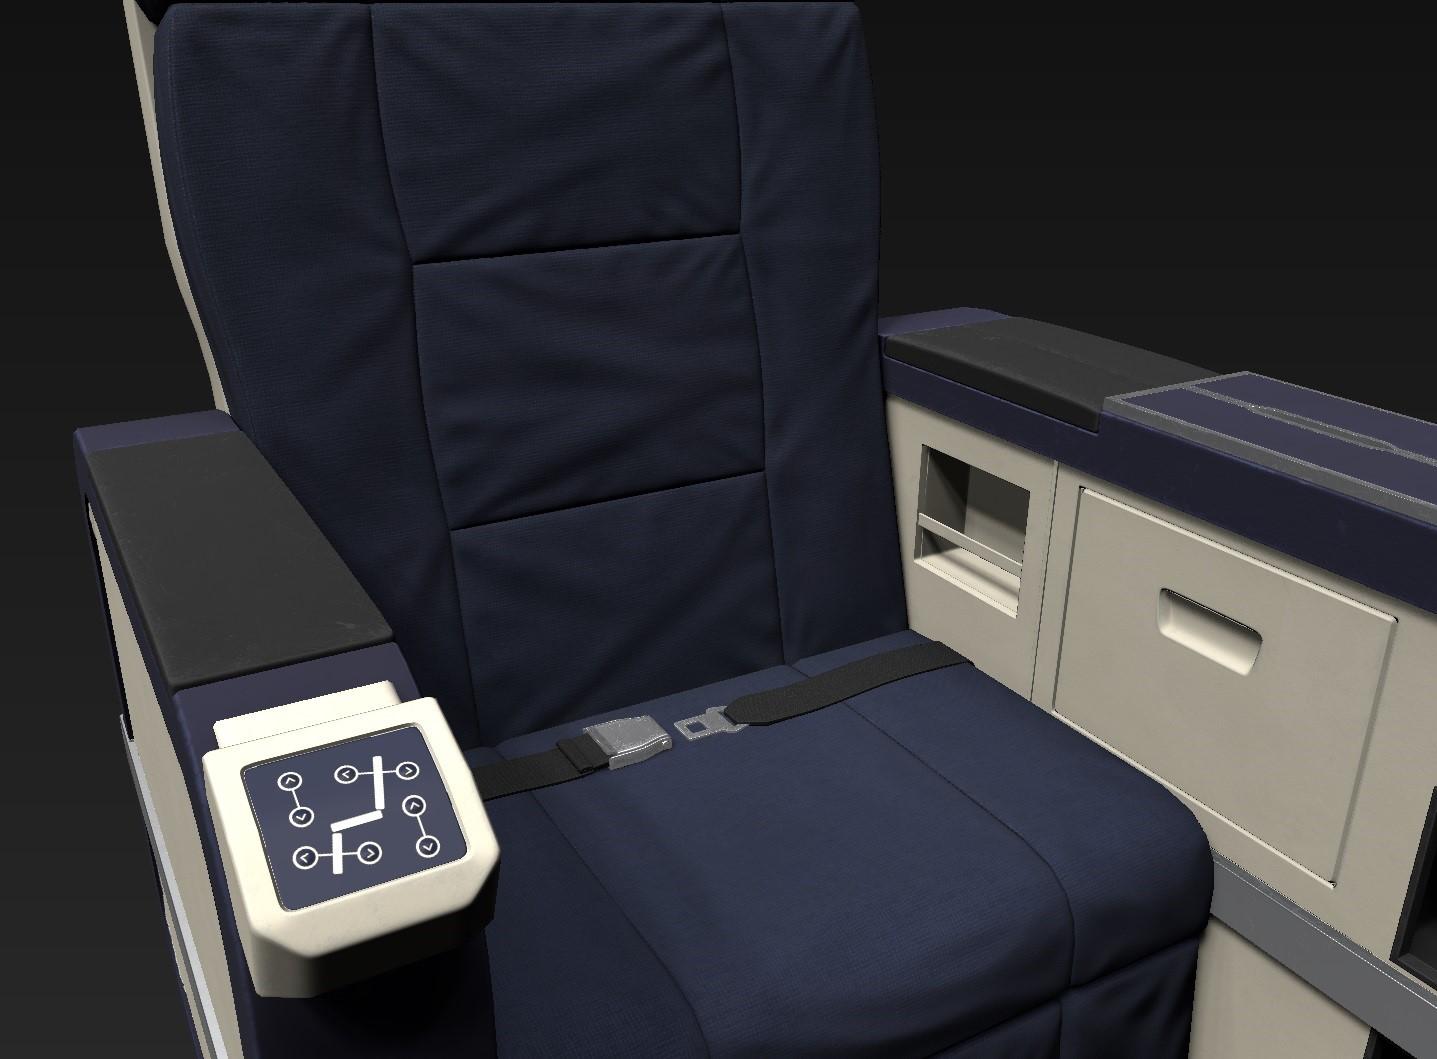 Airplane_Seat_22.jpg